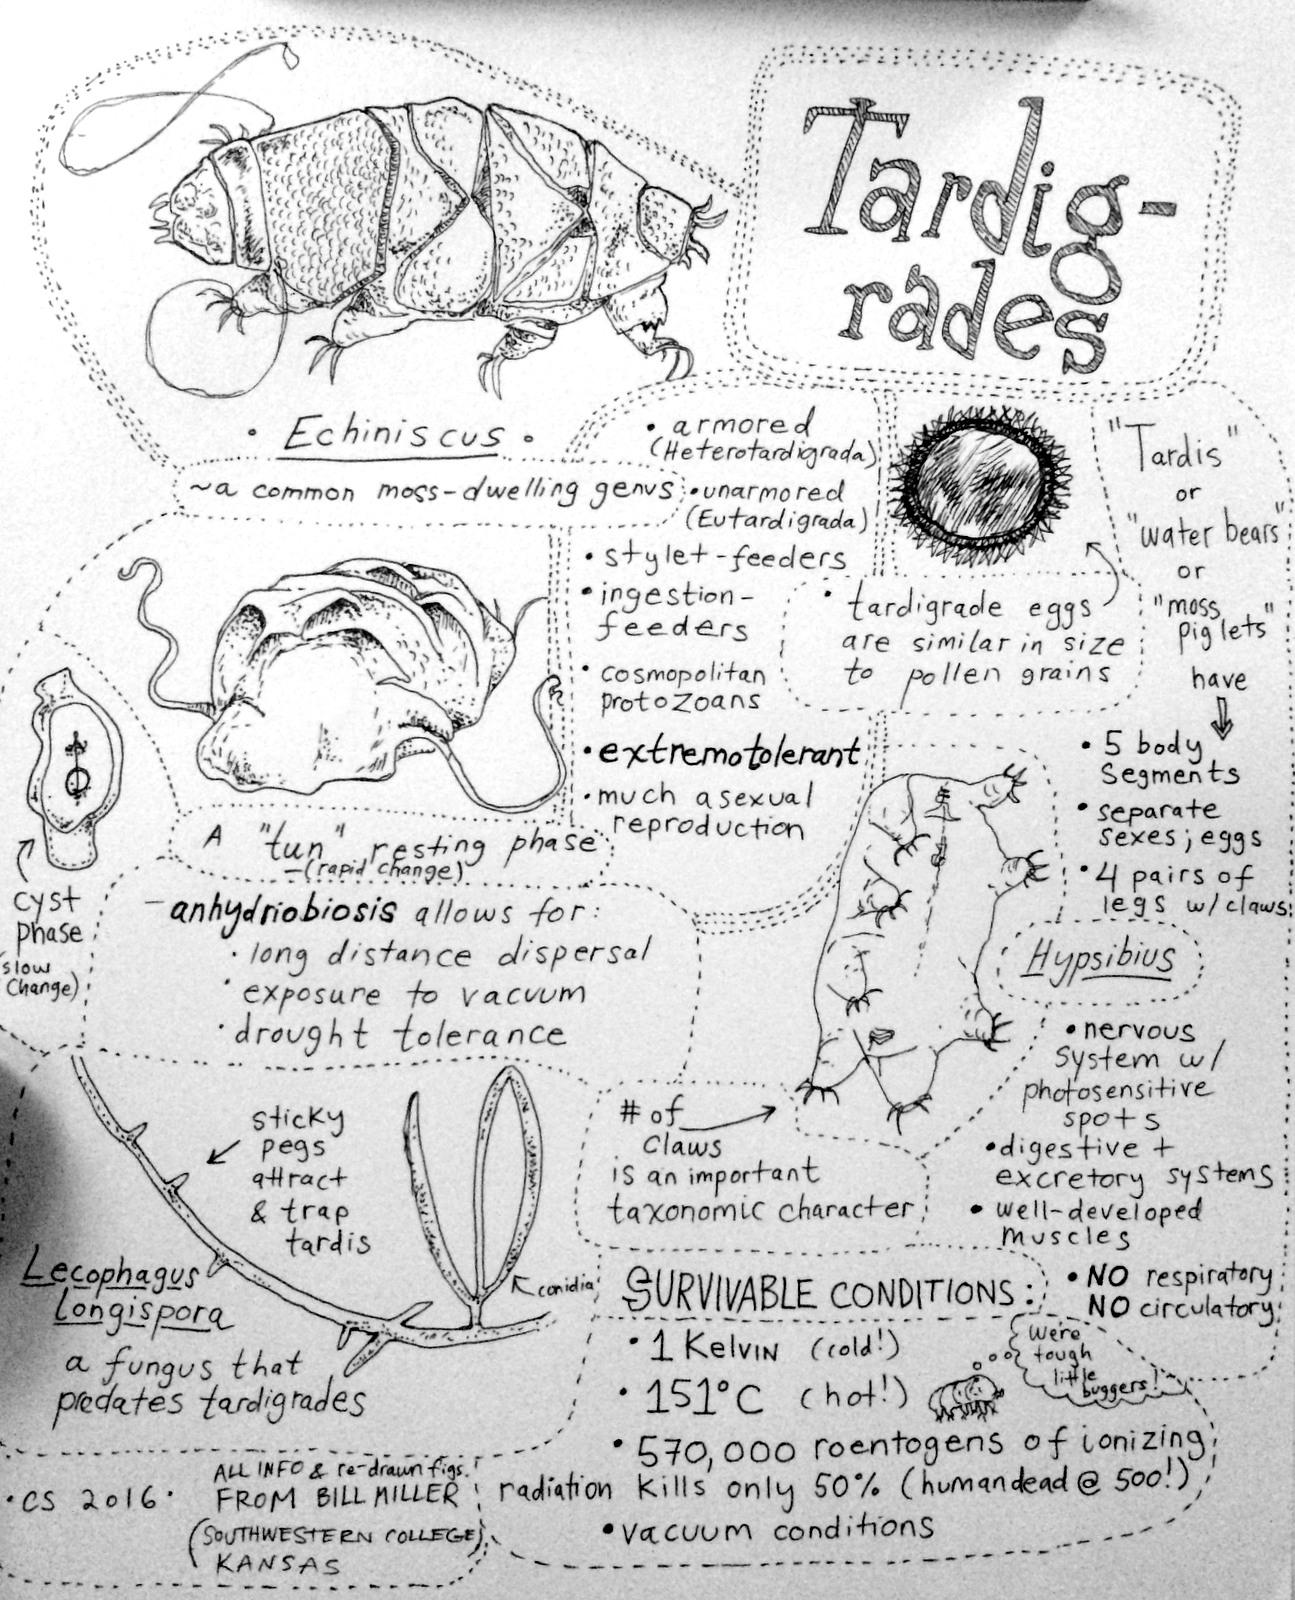 Christian Schwarz's notes on Tardigrade Biology